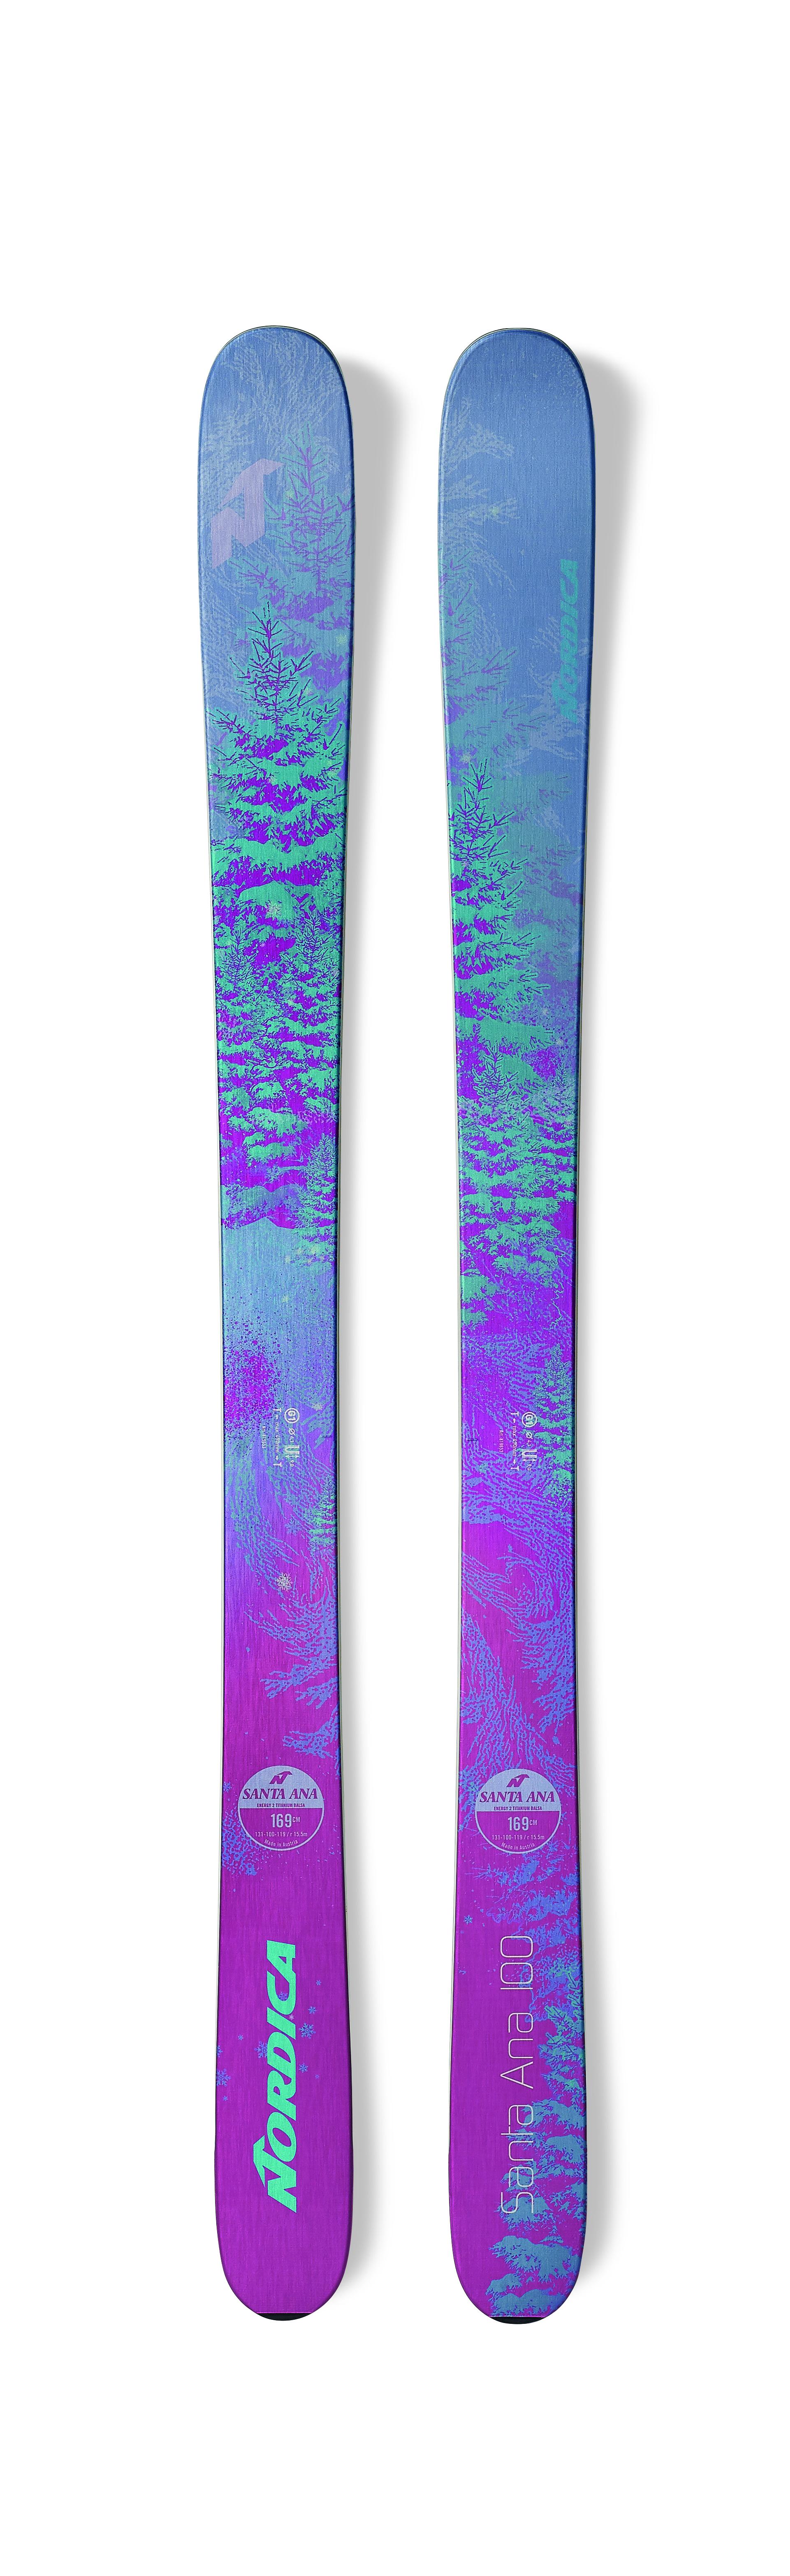 Nordica Santa Ana 100 Womens Ski 2019 c51b25a375c7